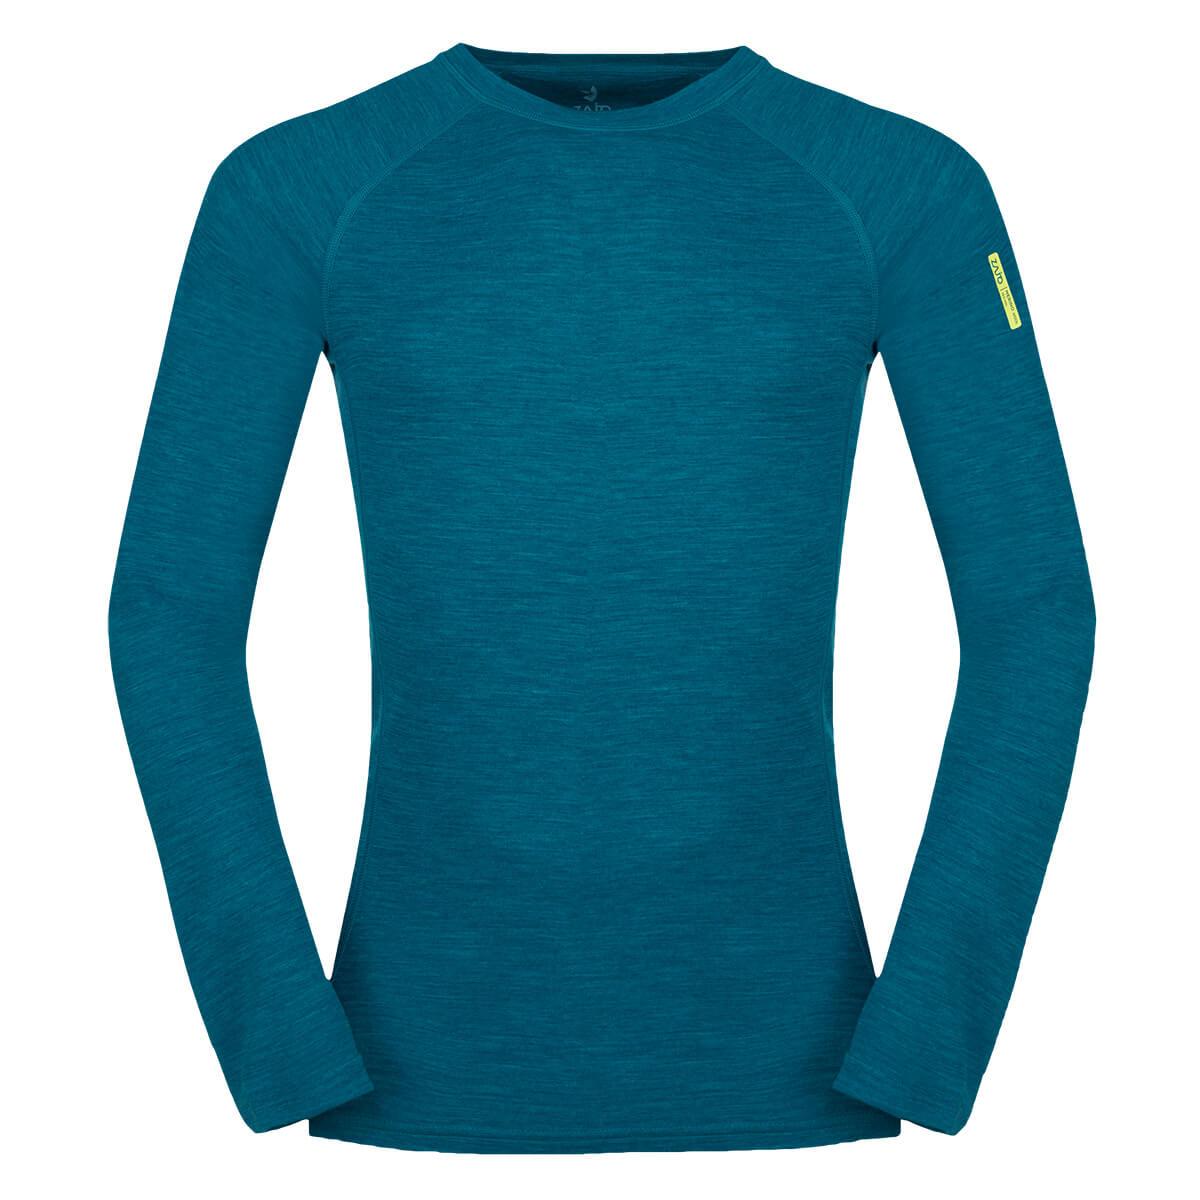 ZAJO Bergen Merino T-shirt LS Deep Lagoon Pánske tričko - veľkosť M